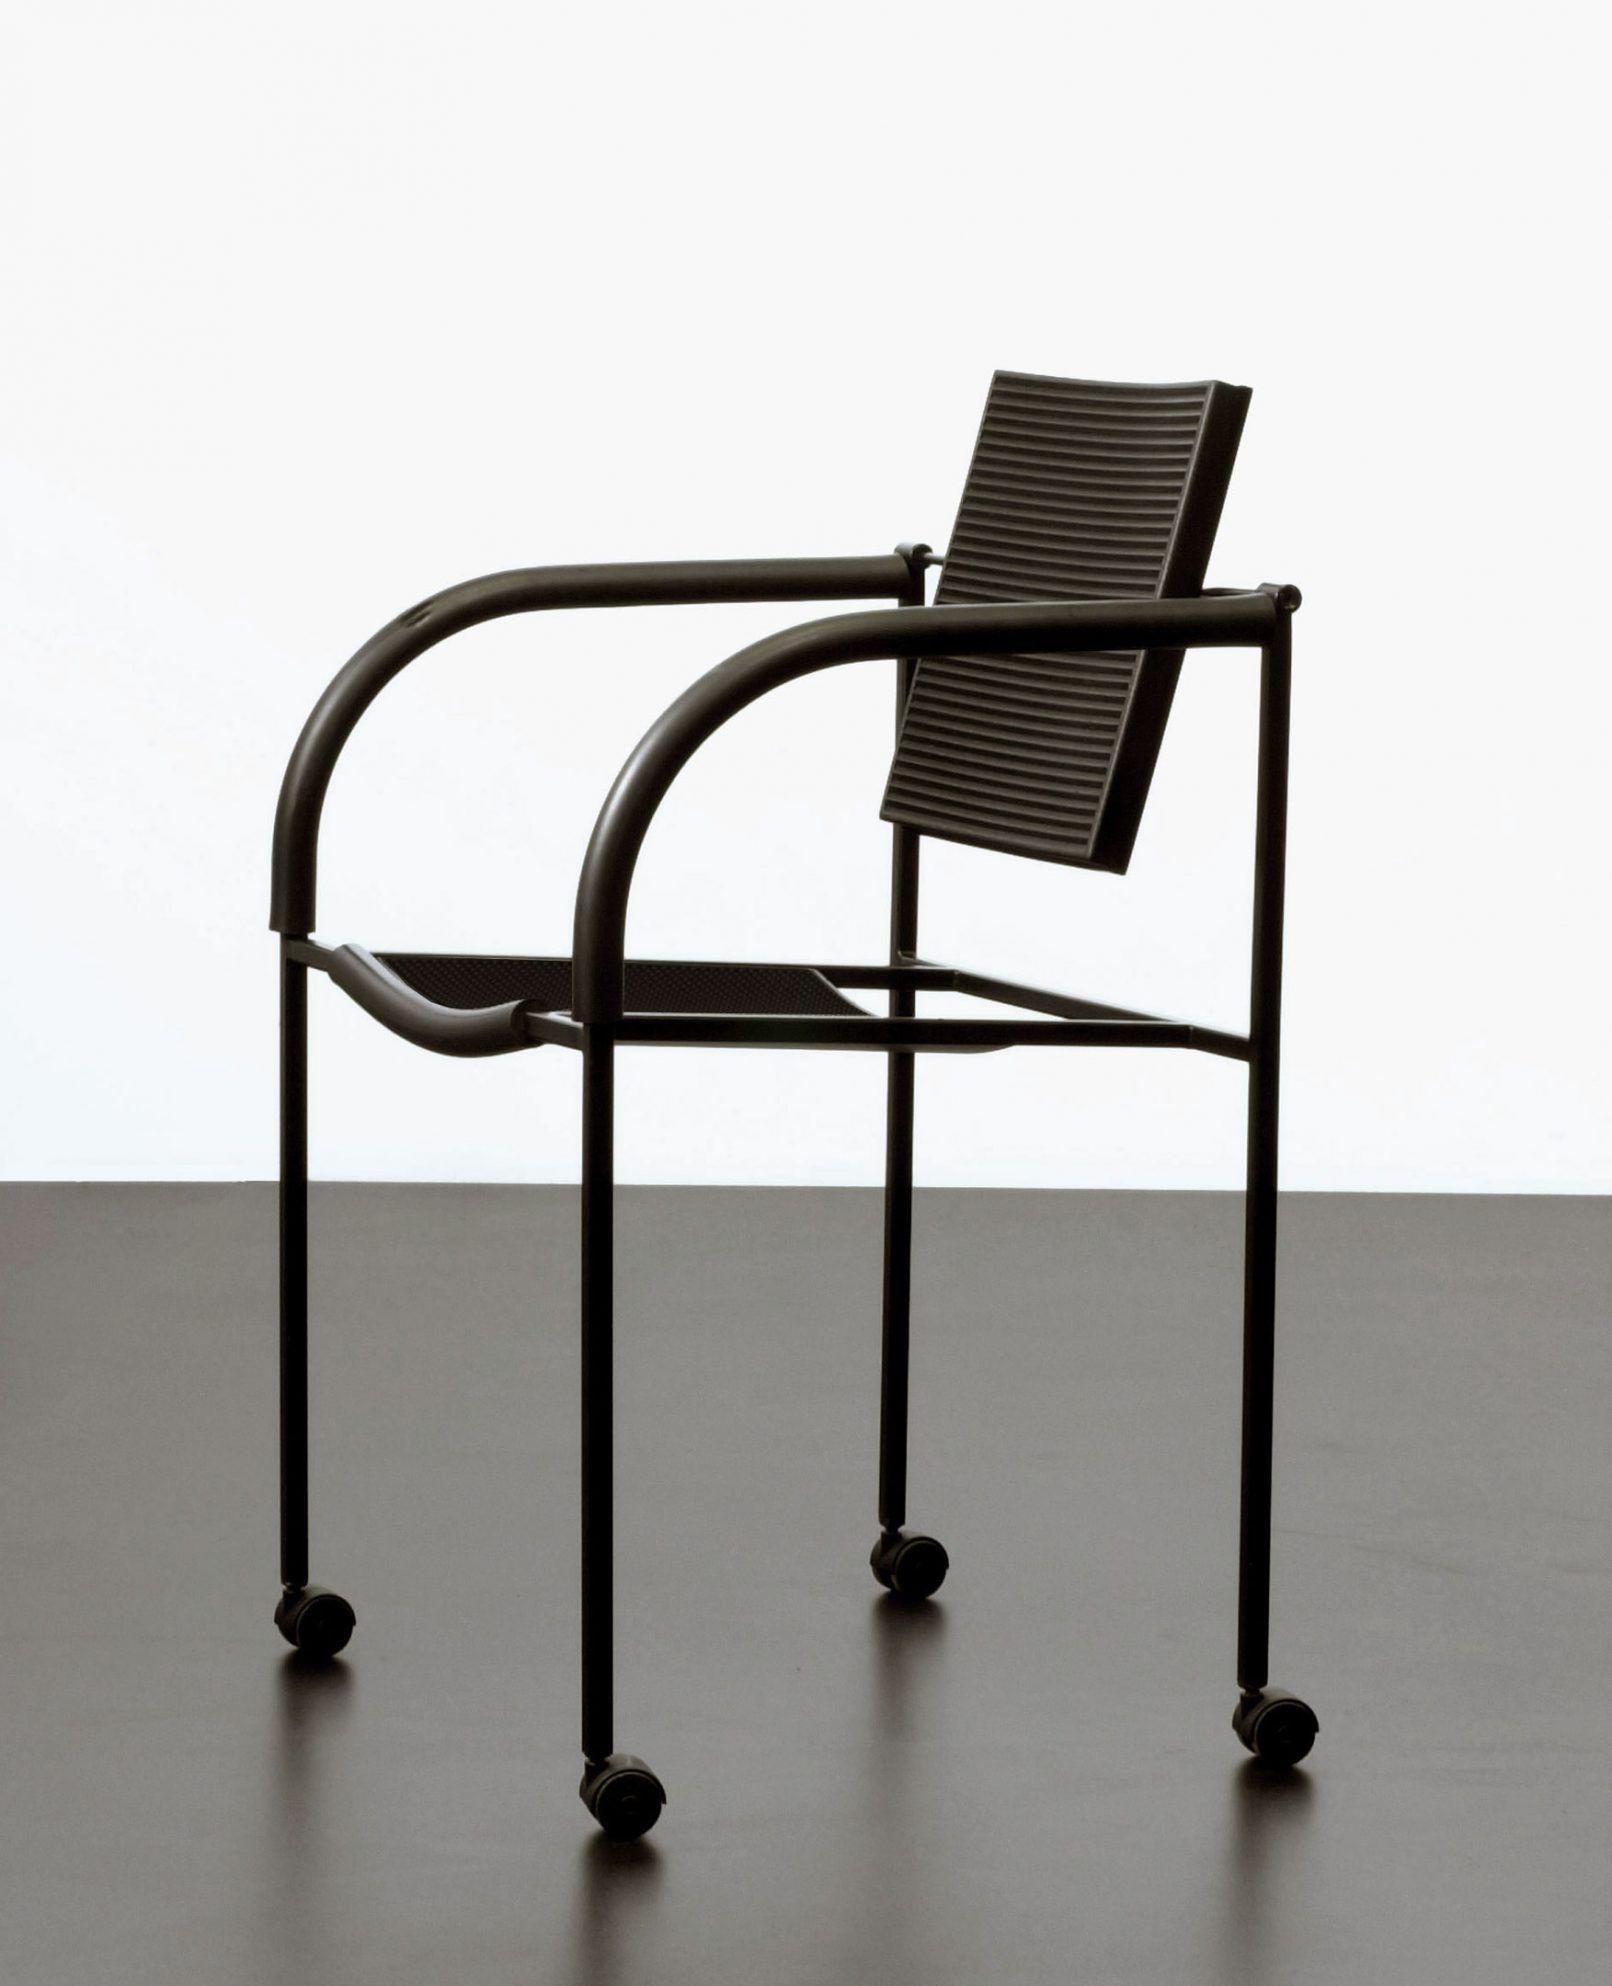 Zeus Krzeslo Comoda Route Chair Style Lounge Luxe Interiors